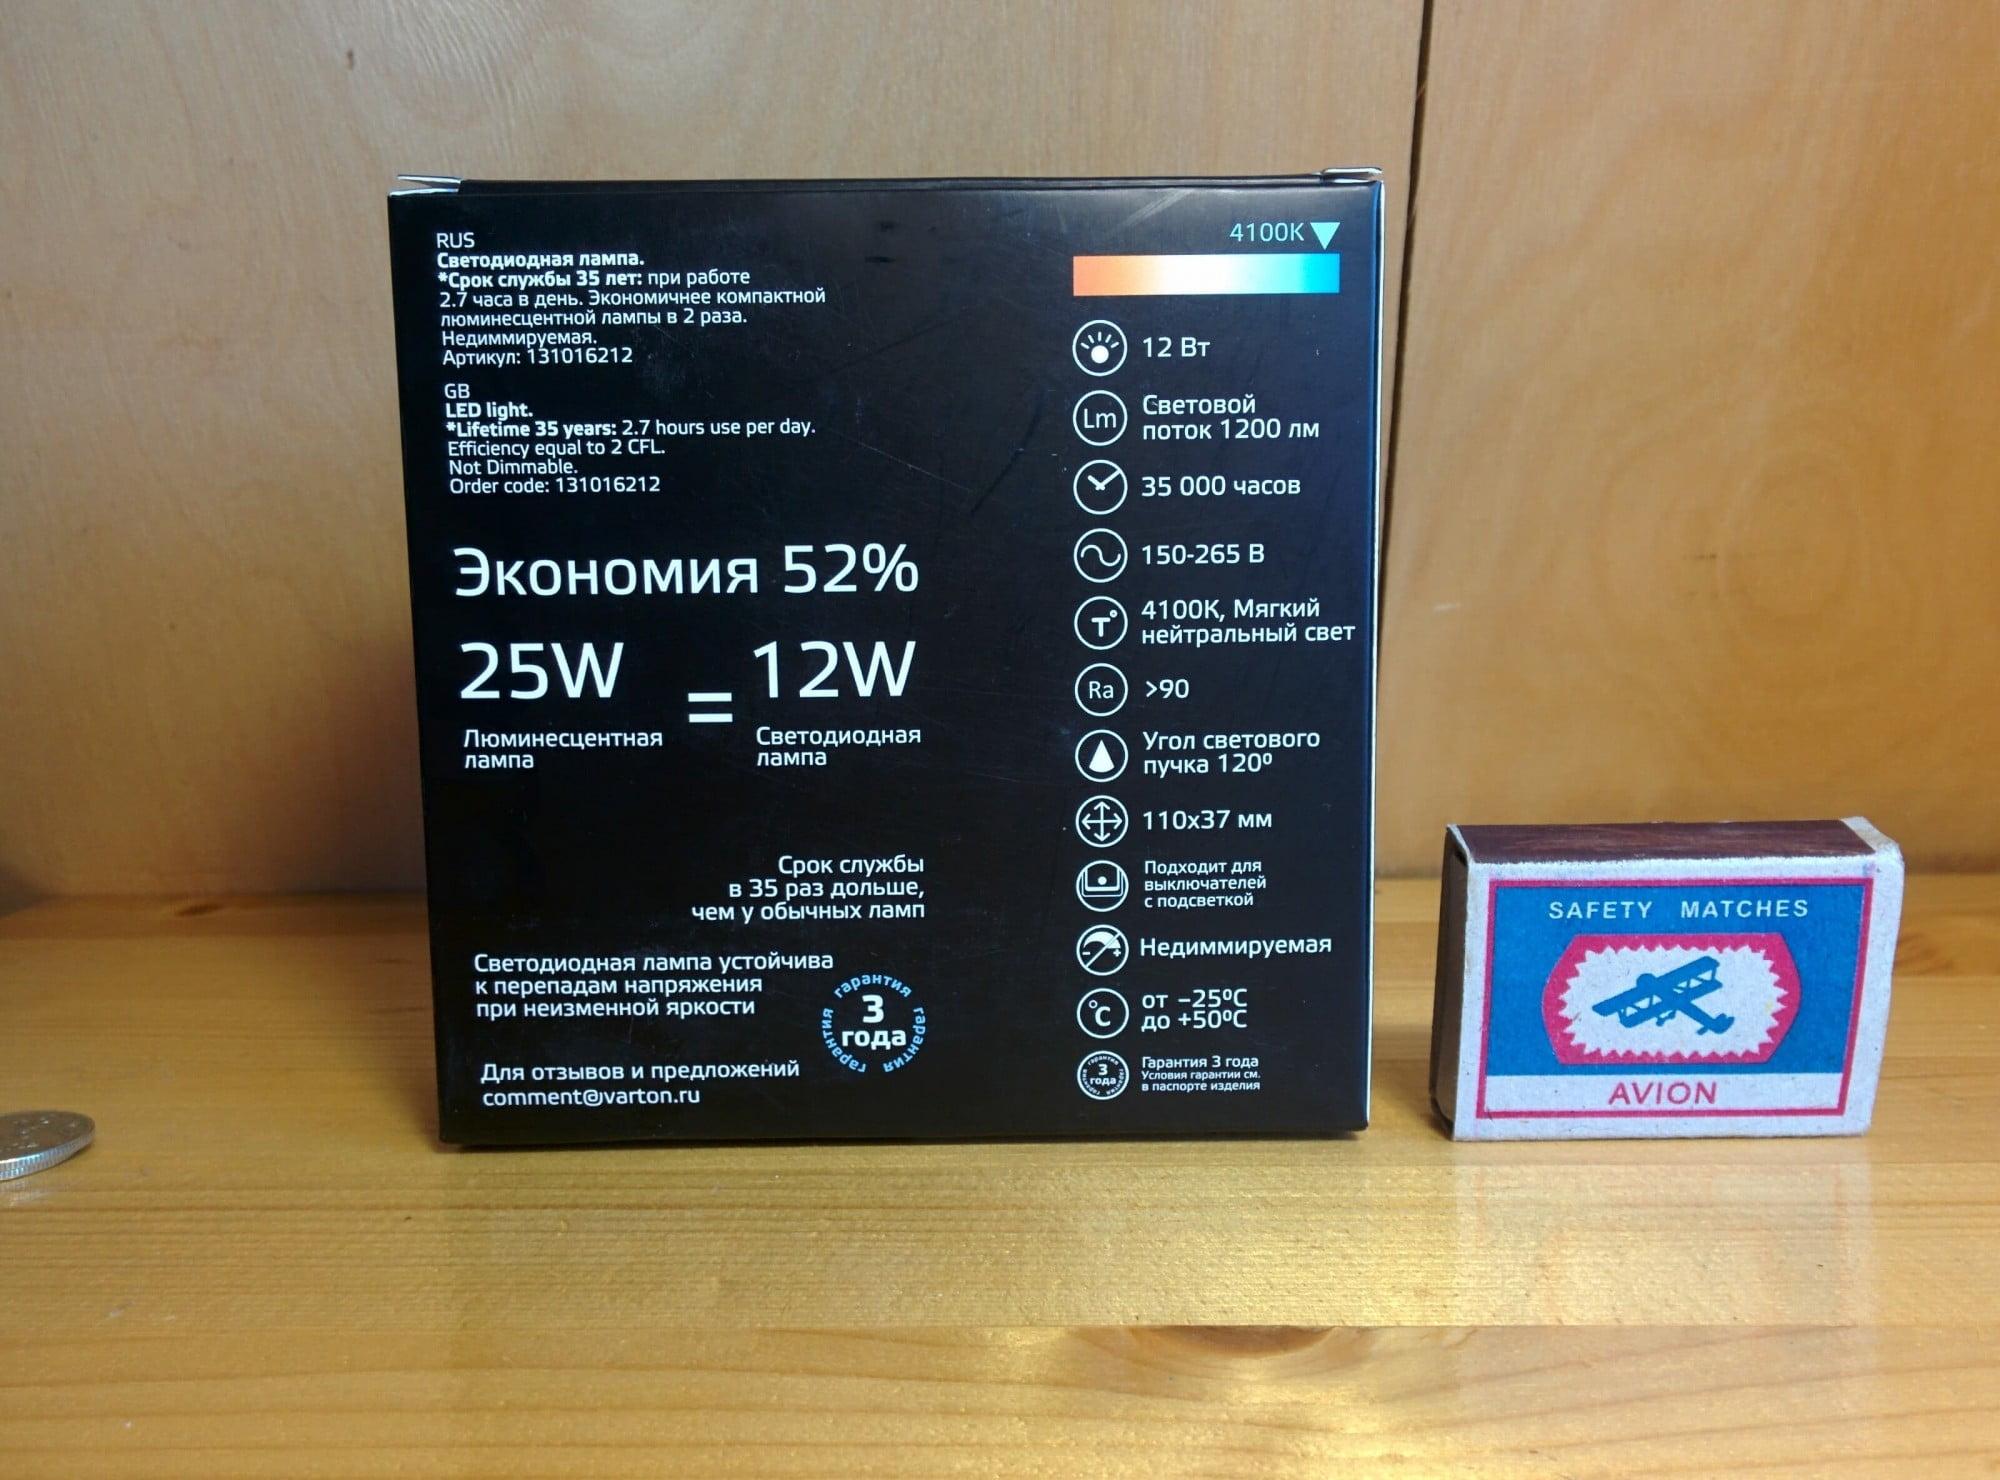 Gauss LED GX70 12W AC150-265V 4100K арт. 131016212 Характеристики